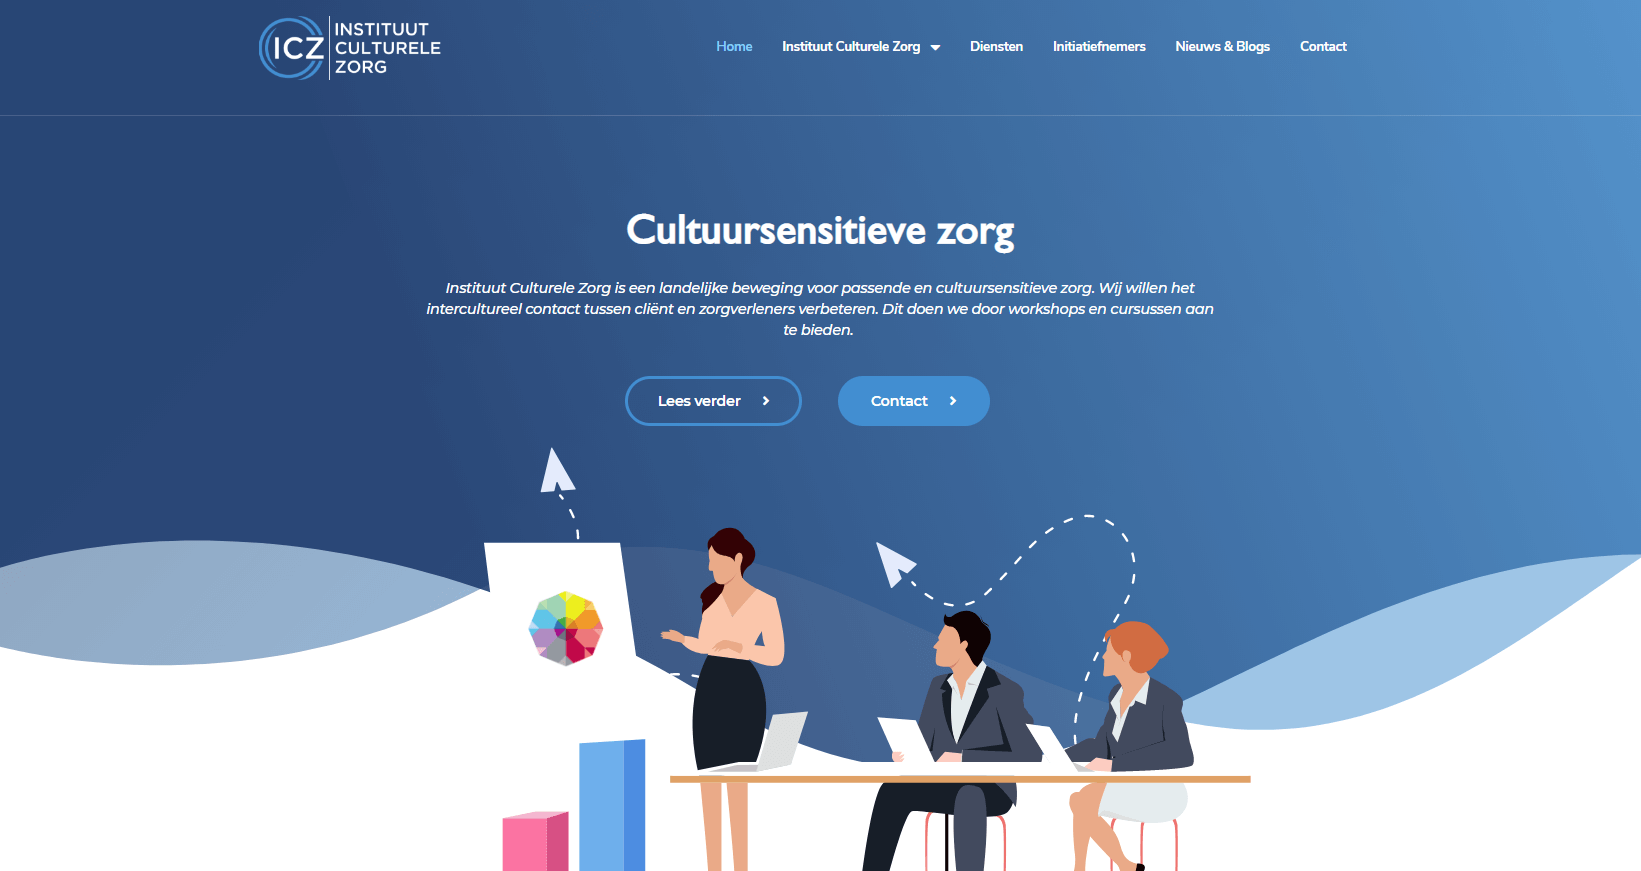 Culturelezorg.nl